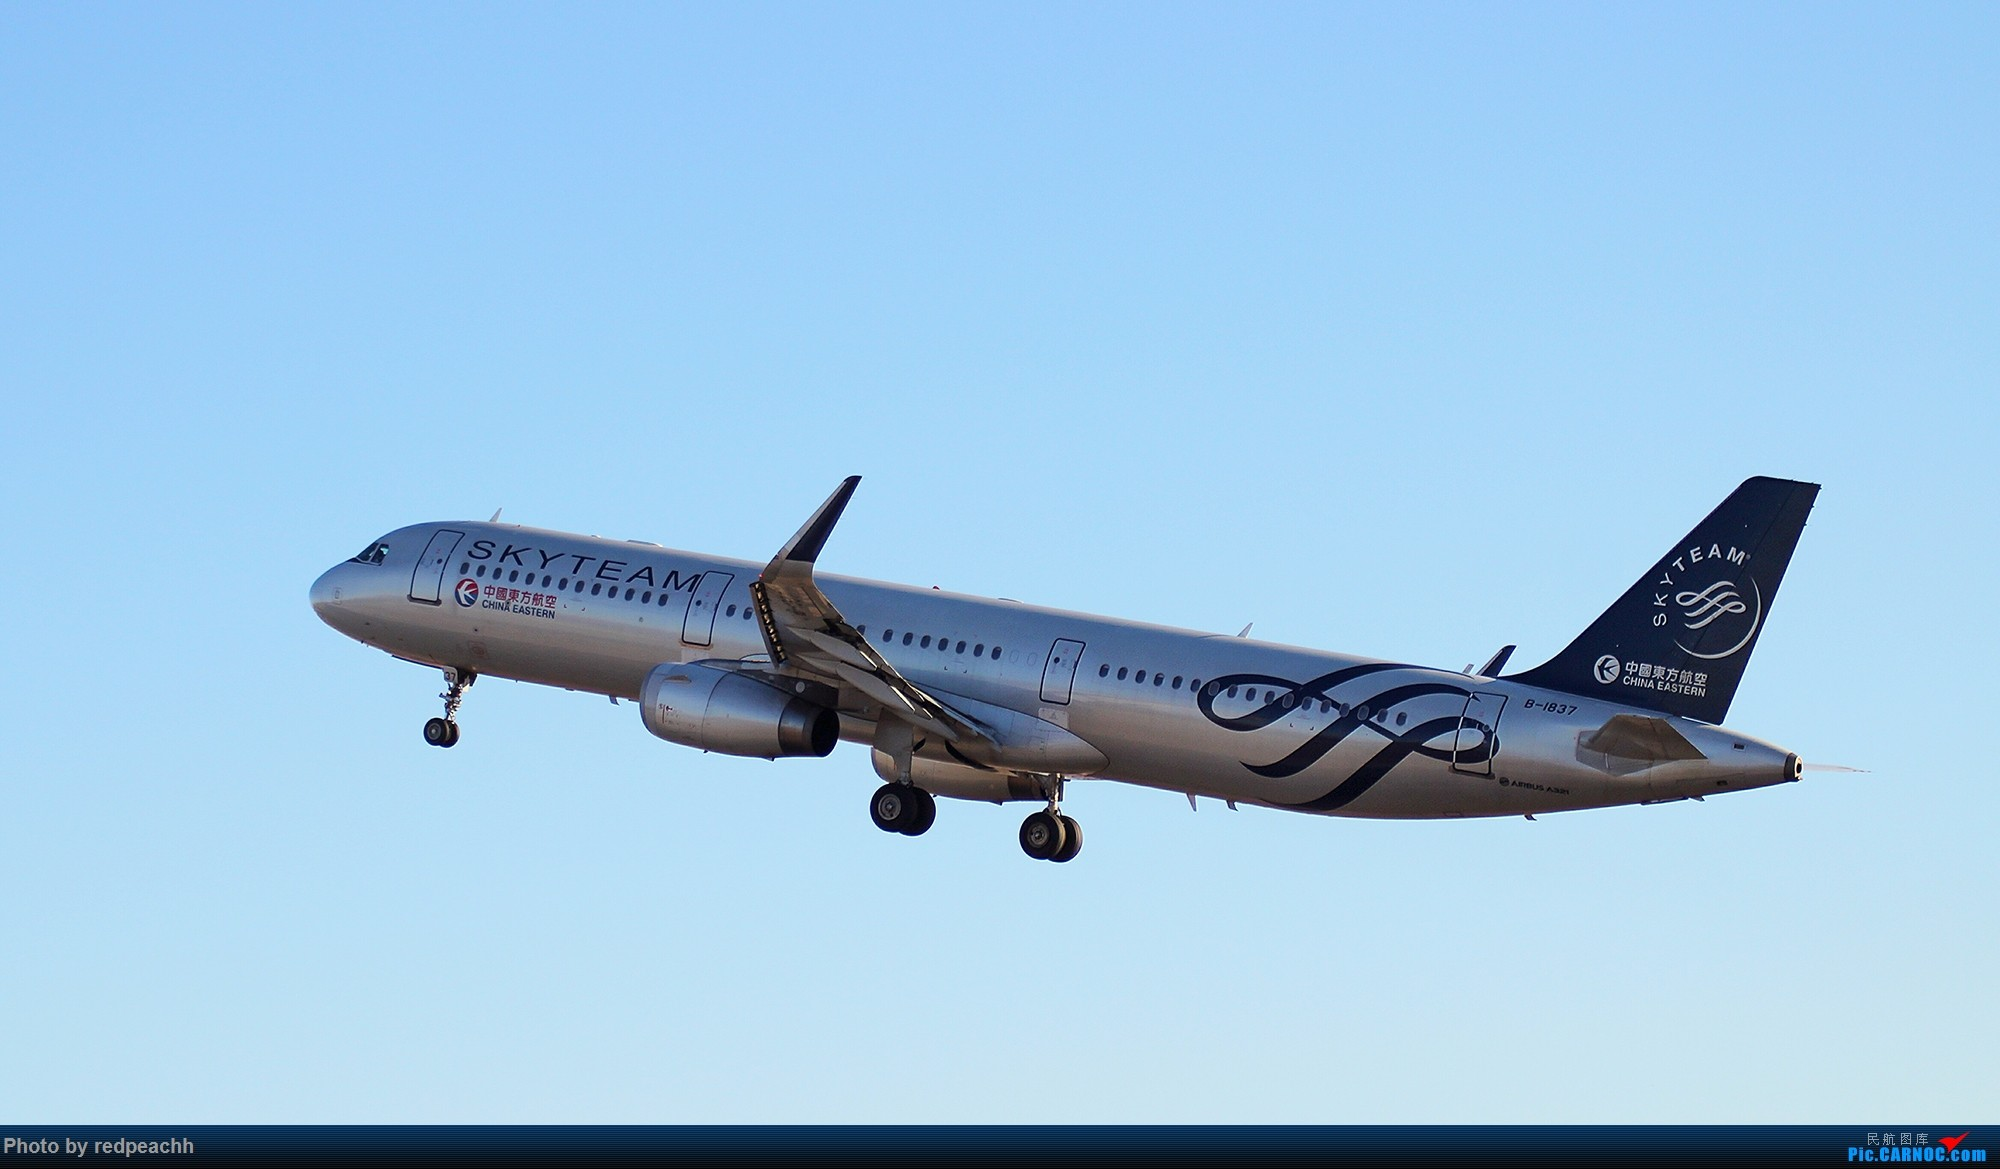 Re:[原创](持续更新)河北人为拍机而首都机场2日游(杨二营、八卦台)虽均为常规货但值得纪念(36L) AIRBUS A321-200 B-1837 中国北京首都国际机场